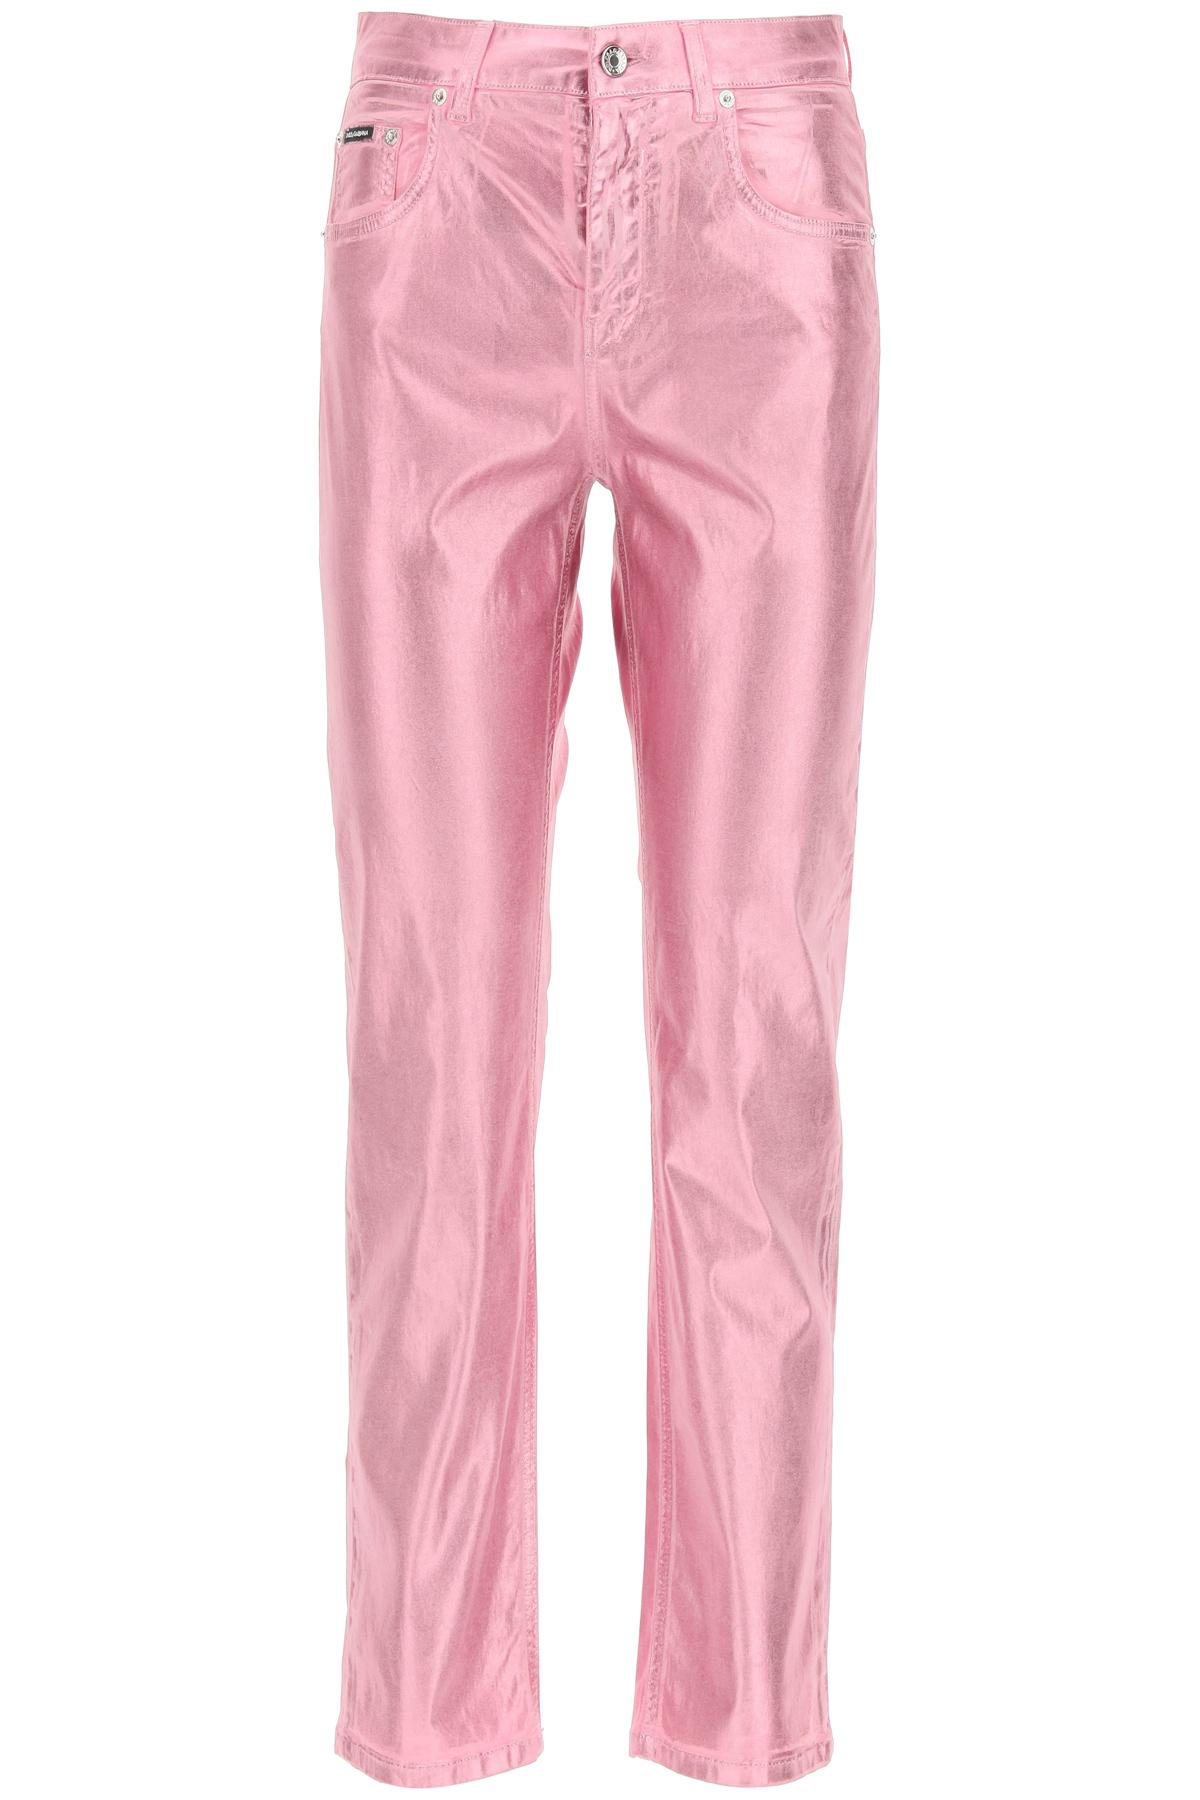 Dolce & gabbana jeans boyfriend laminato